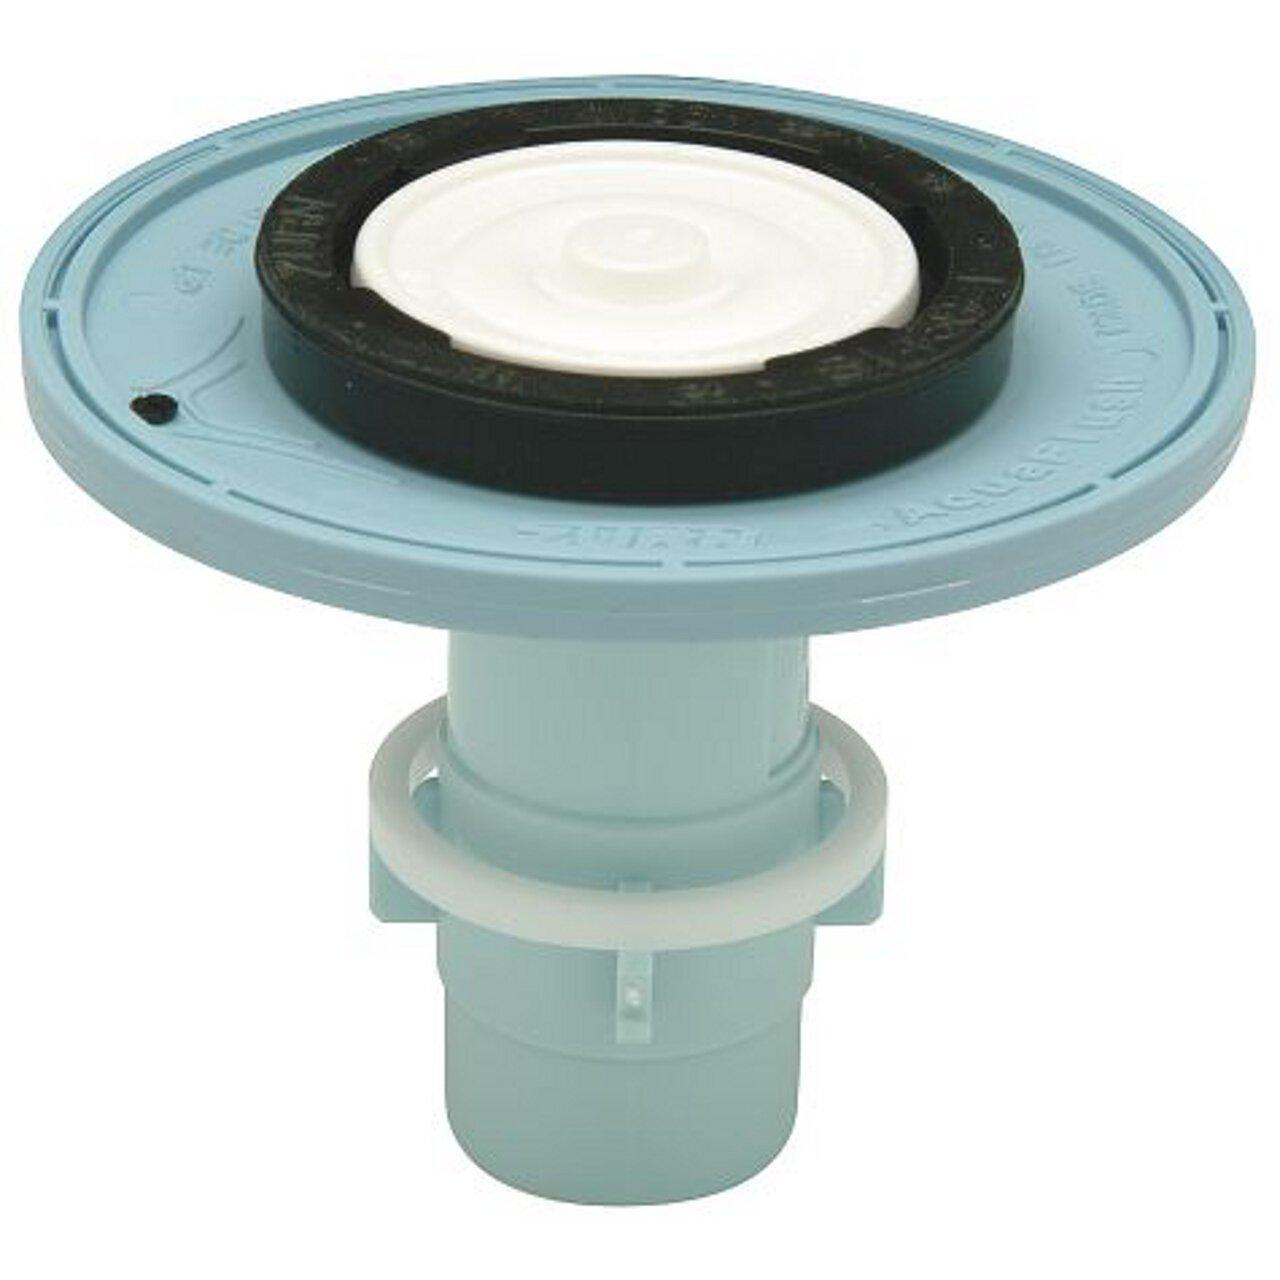 Zurn AquaFlush Closet Repair Kit, P6000-ECR-WS1, 1.6 gpf, Crosses To Sloan A-41-A, Diaphragm Repair Kit